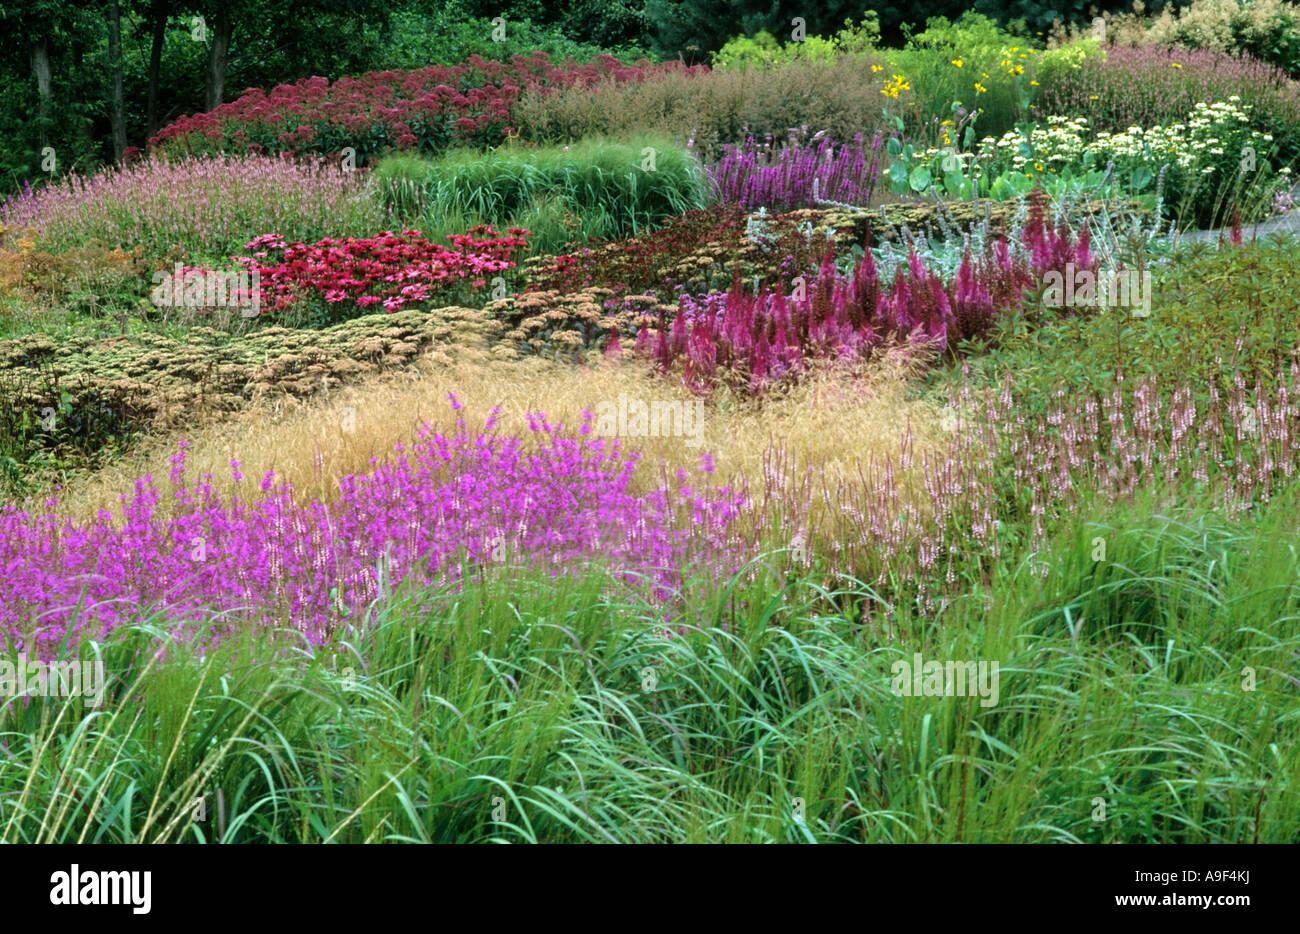 pensthorpe millennium garten norfolk england gr ser lythrum echinacea sedum drift pr rie. Black Bedroom Furniture Sets. Home Design Ideas